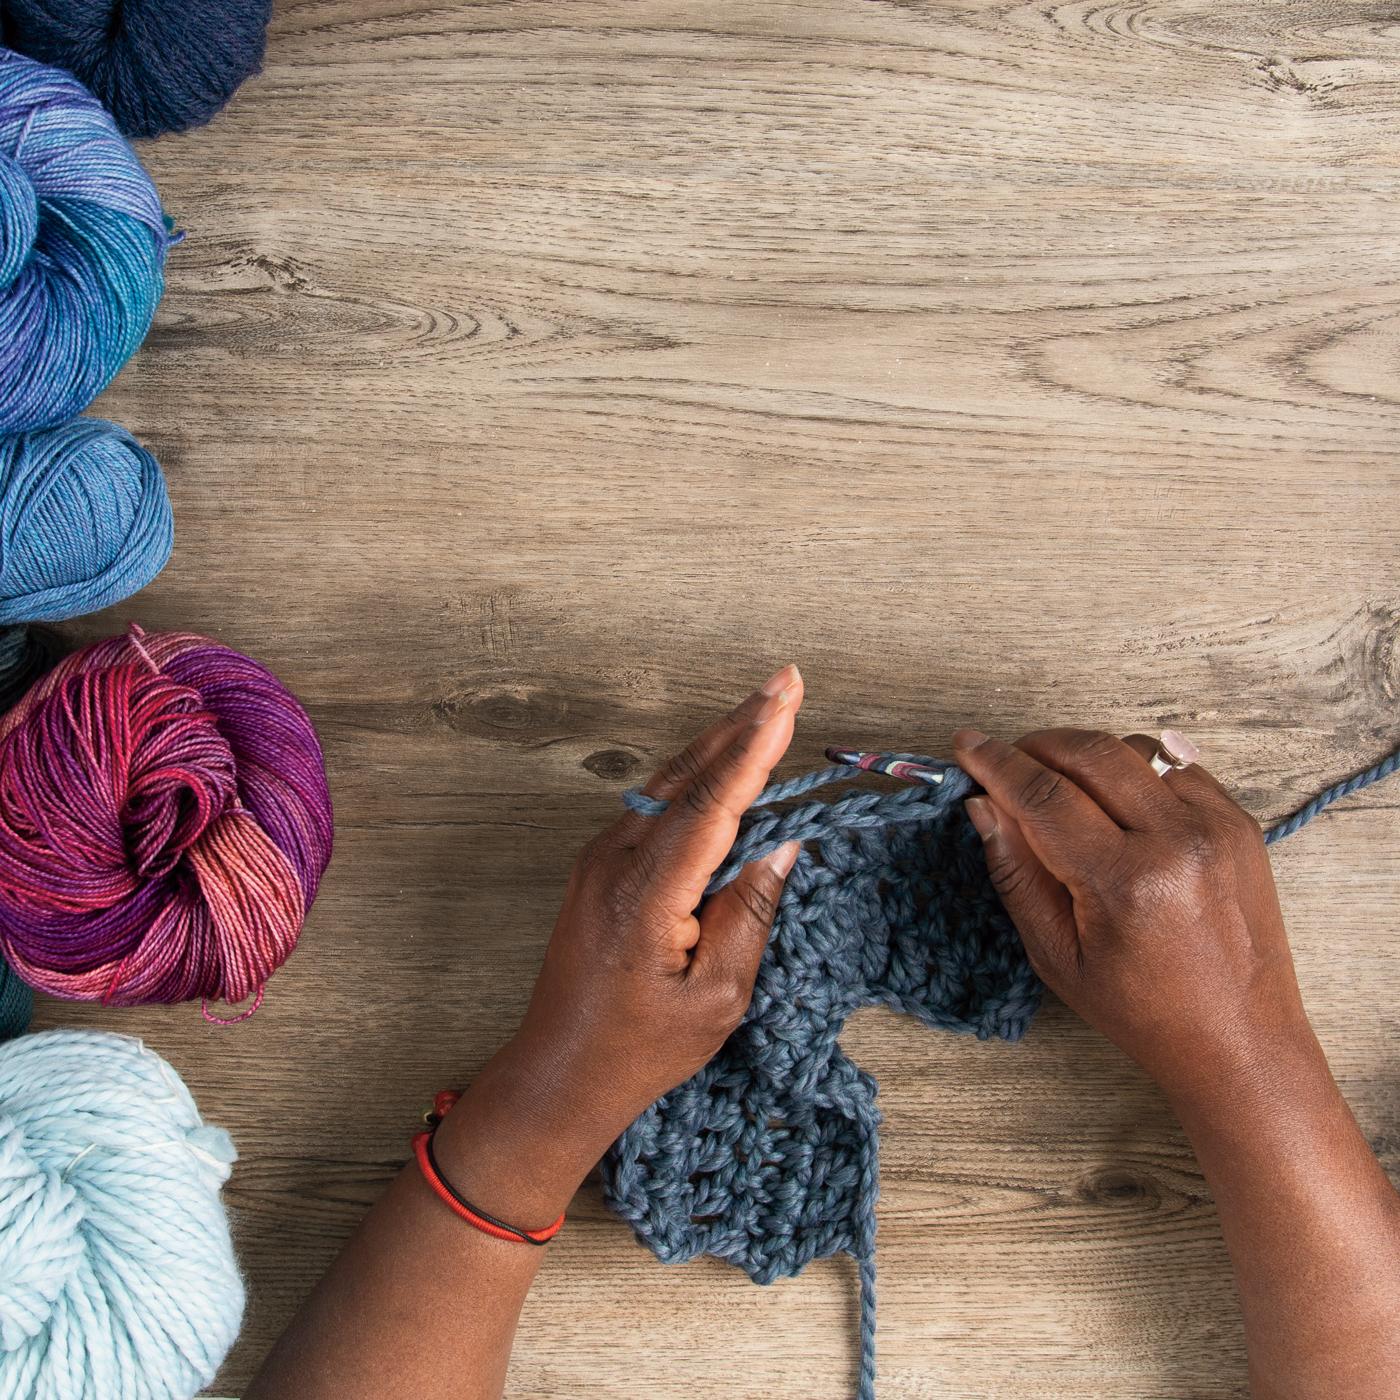 Crochet Jobs, Part 3 - Teaching Crochet with Arica Presinal & Pia Thadani